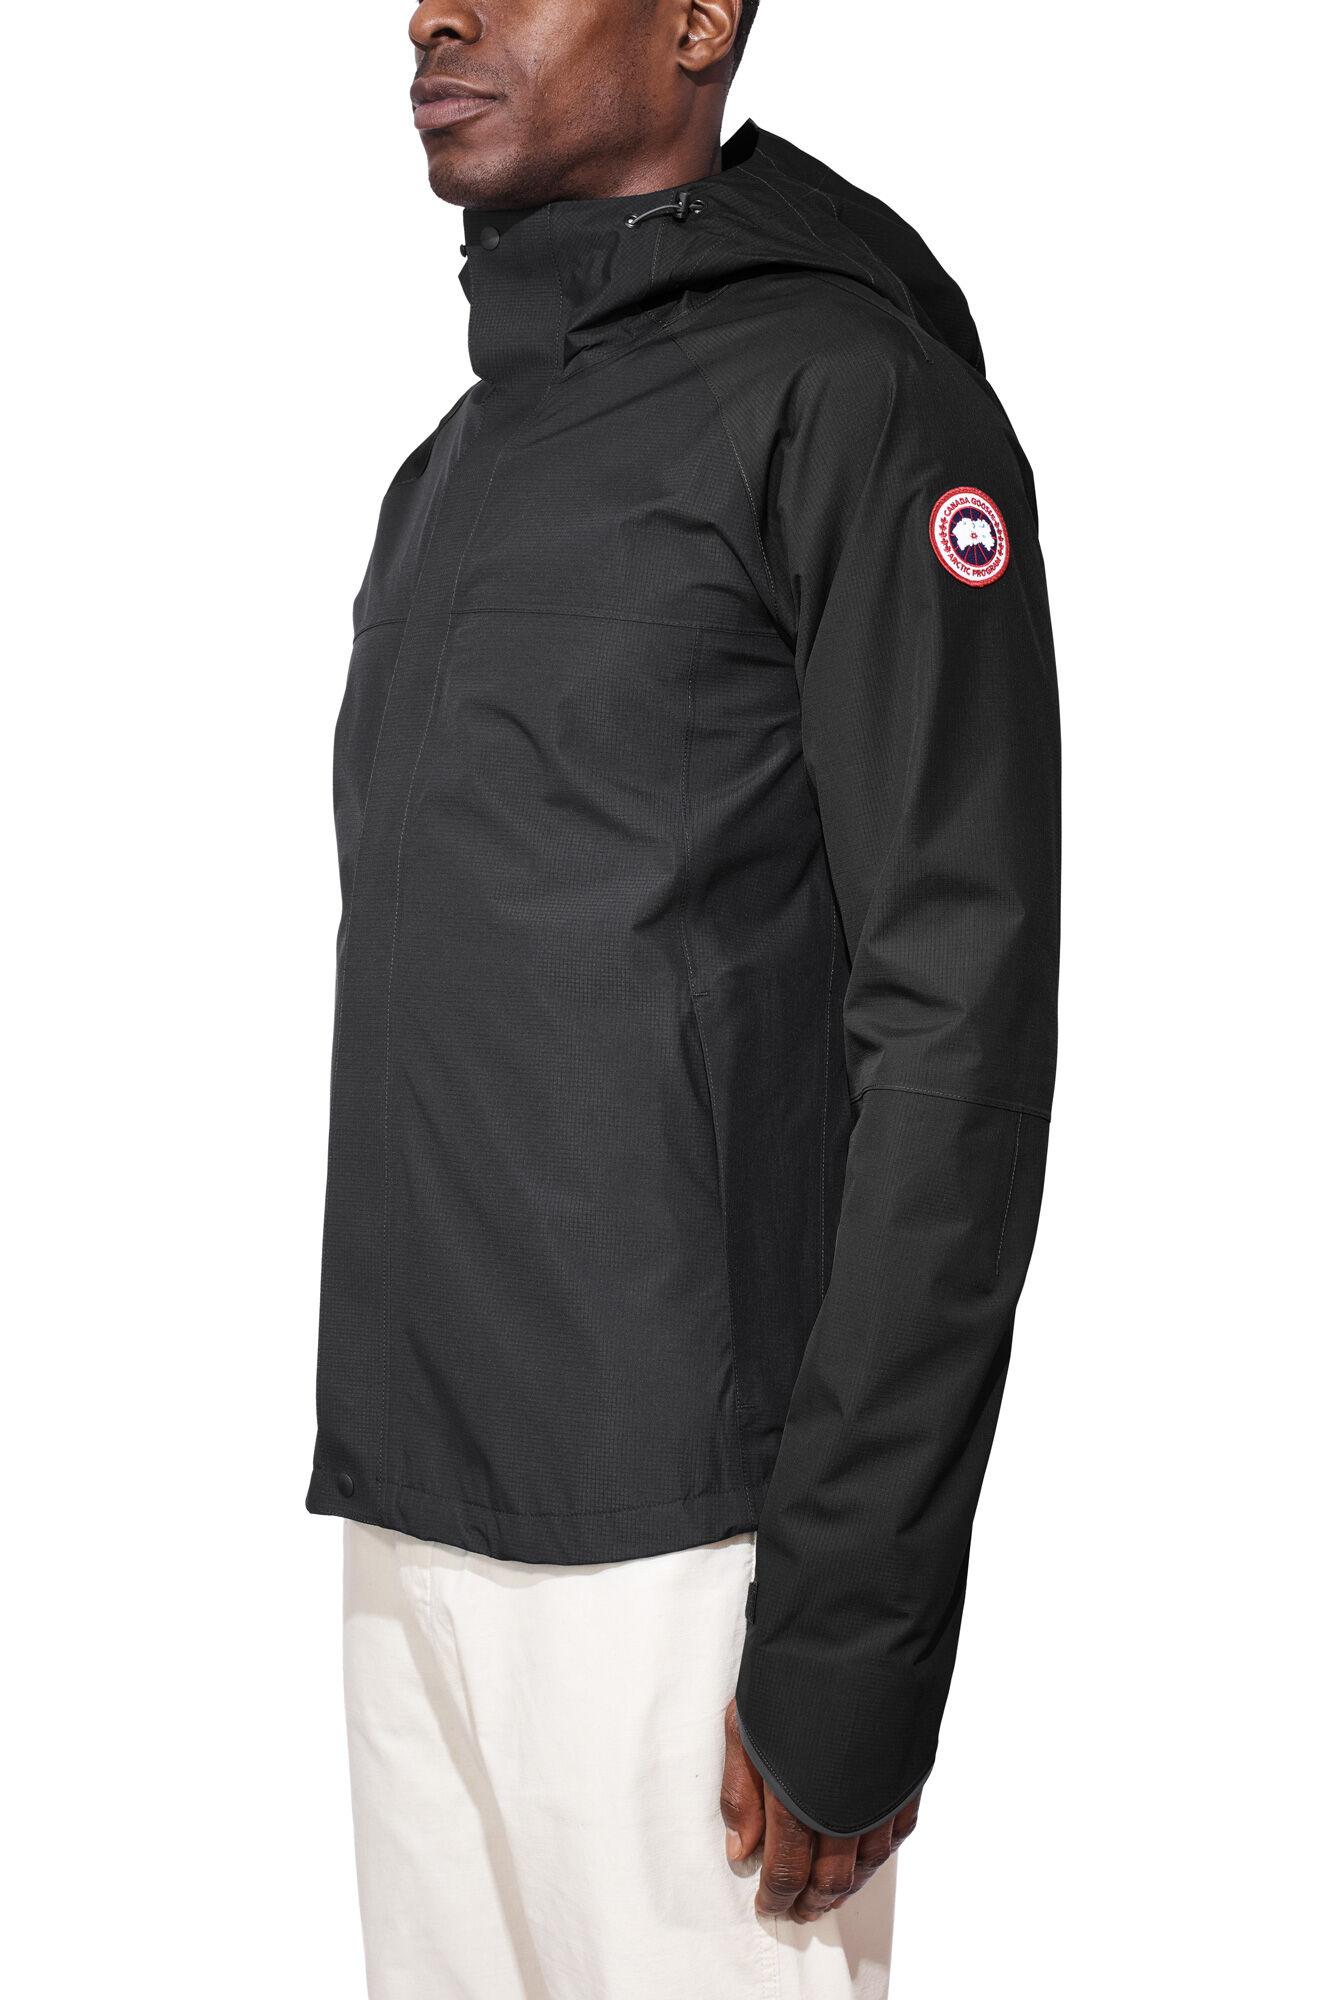 Canada Goose Rain Jacket Mens